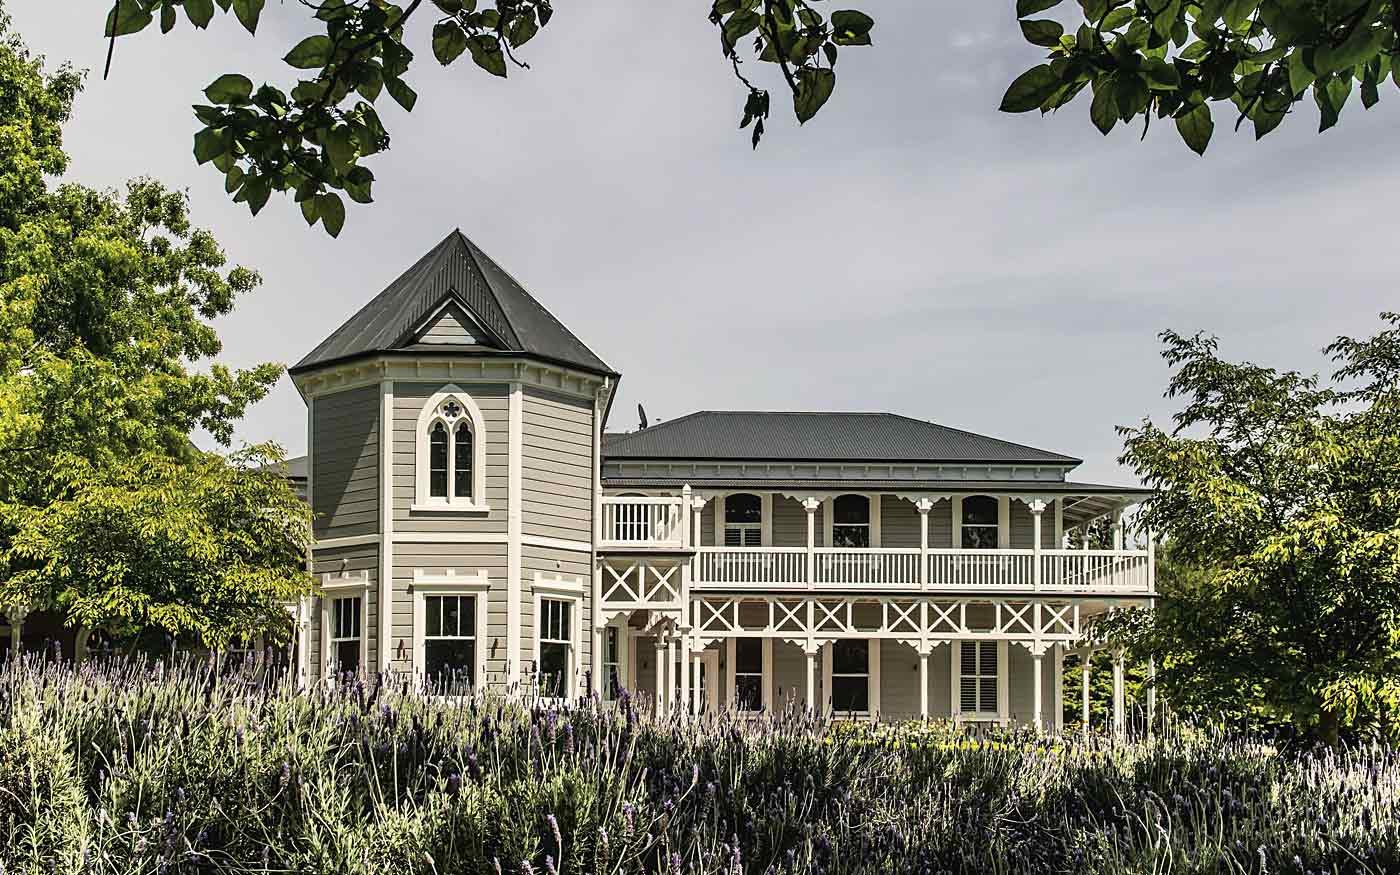 The Marlborough Lodge / NZ